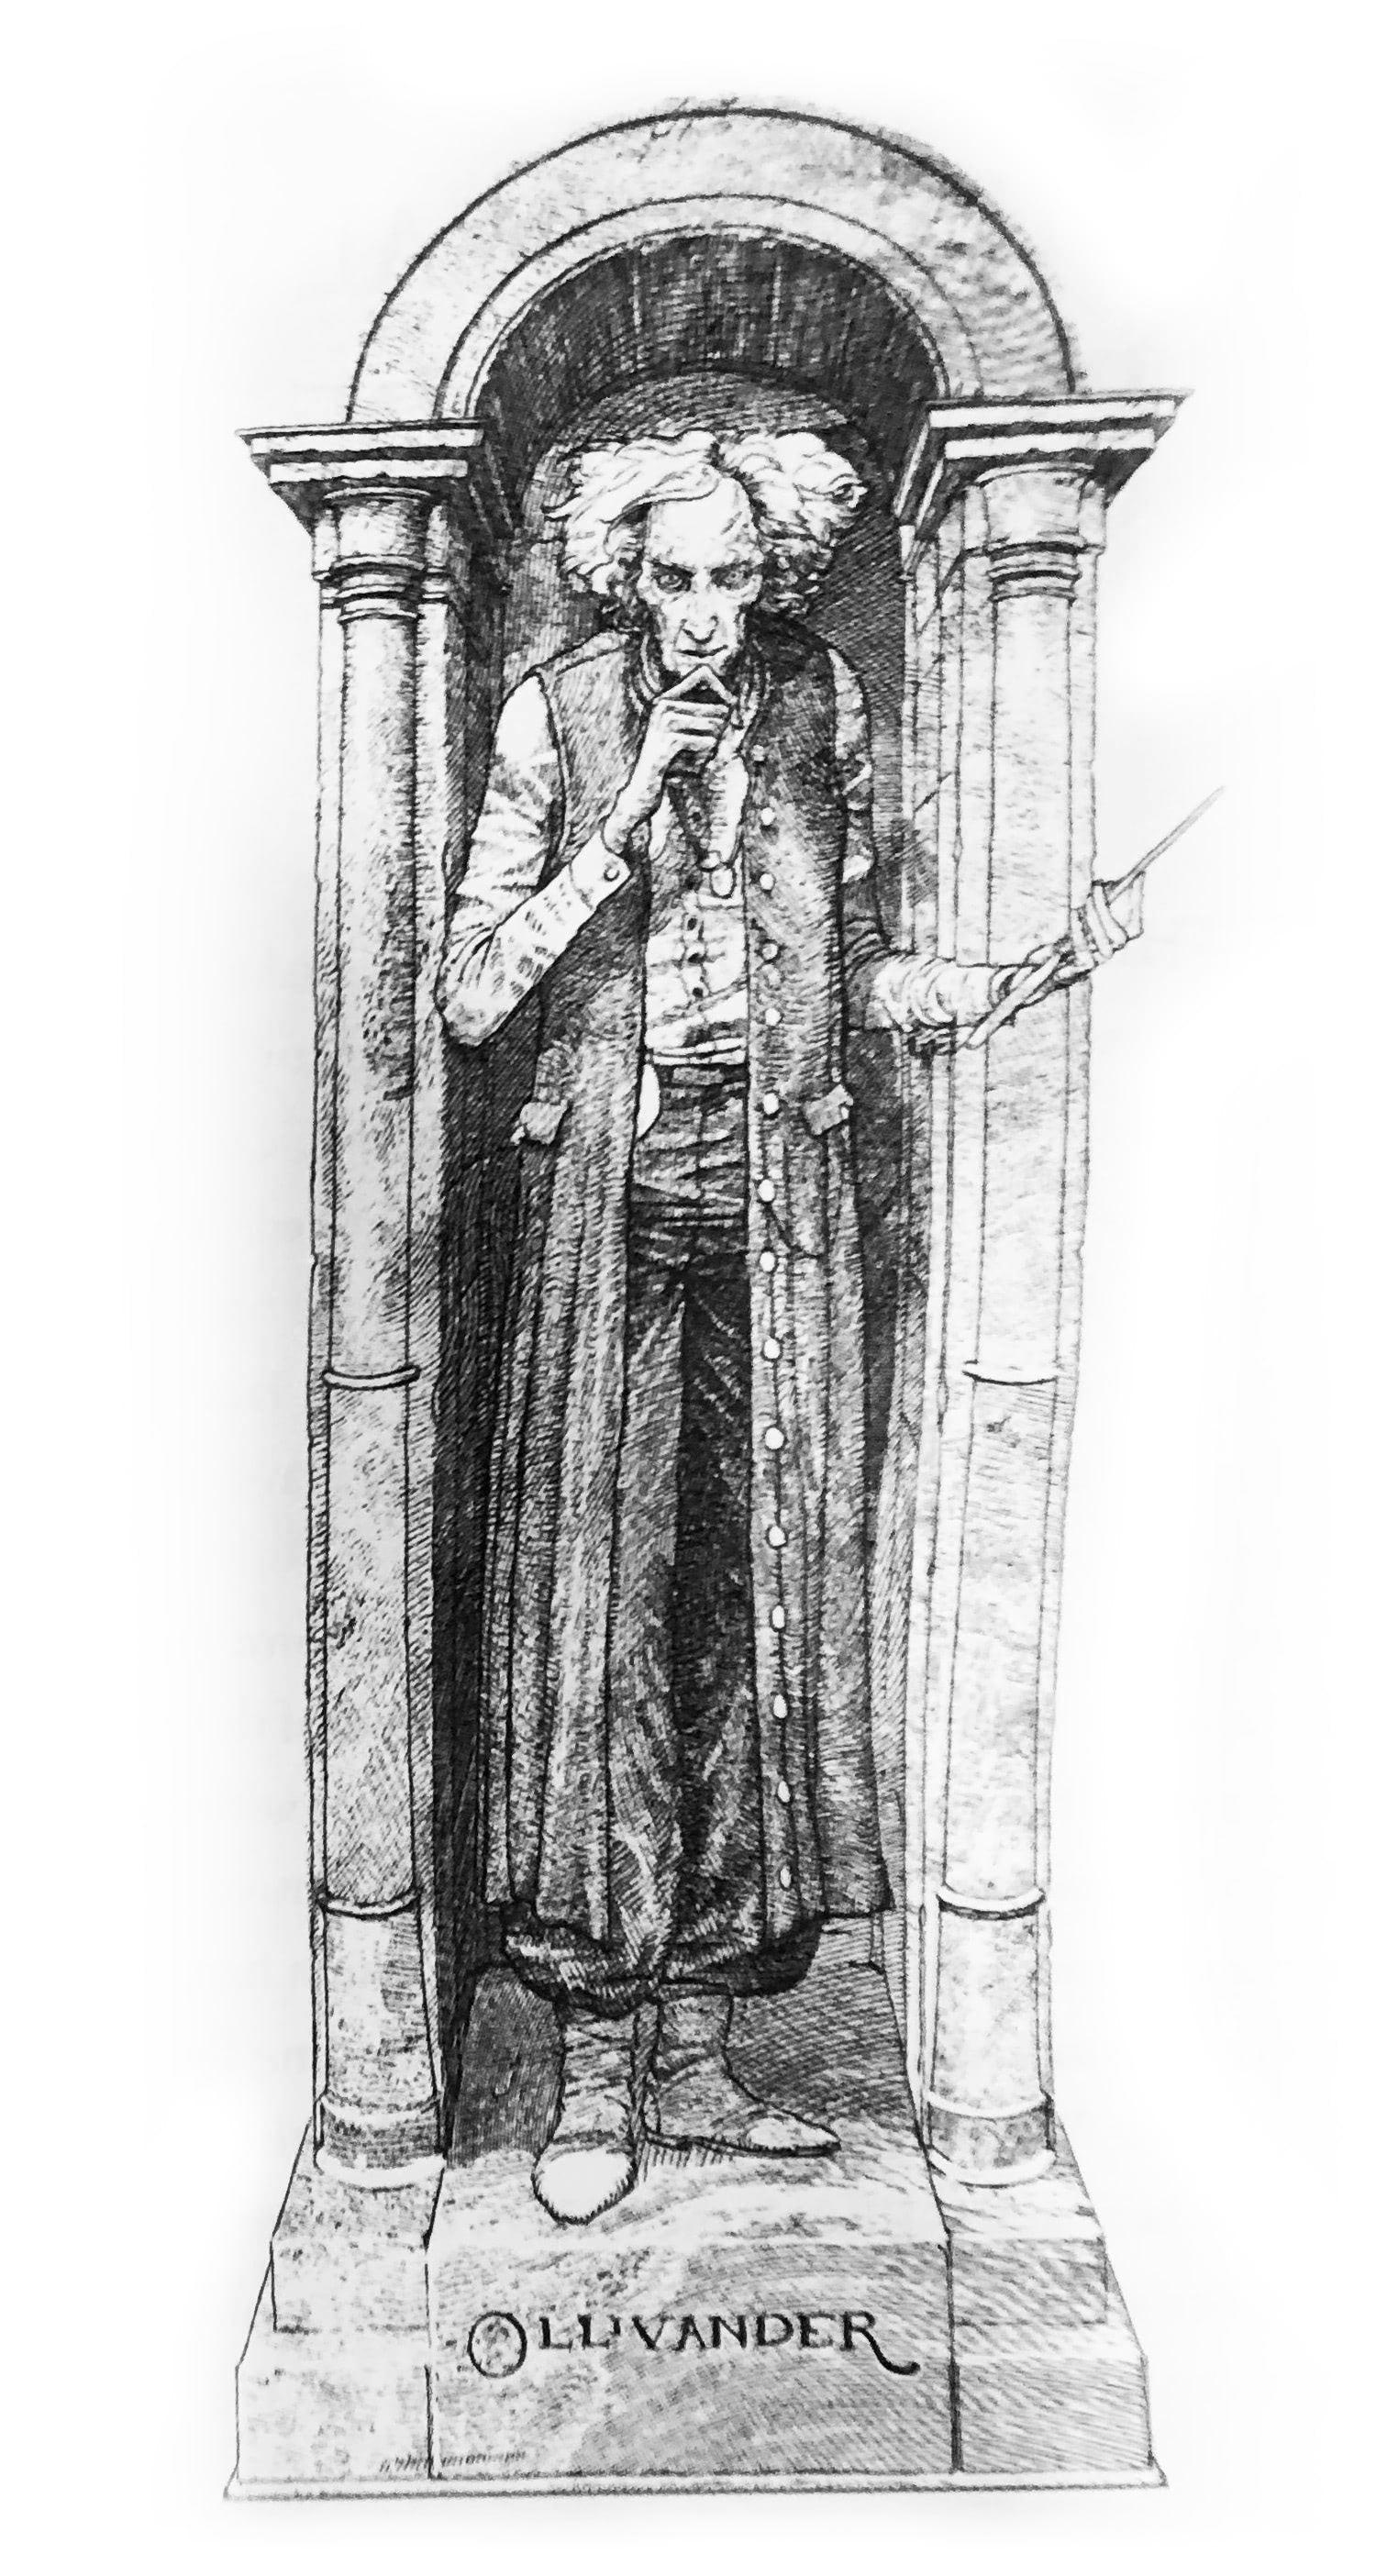 Ollivander illustration (house editions)